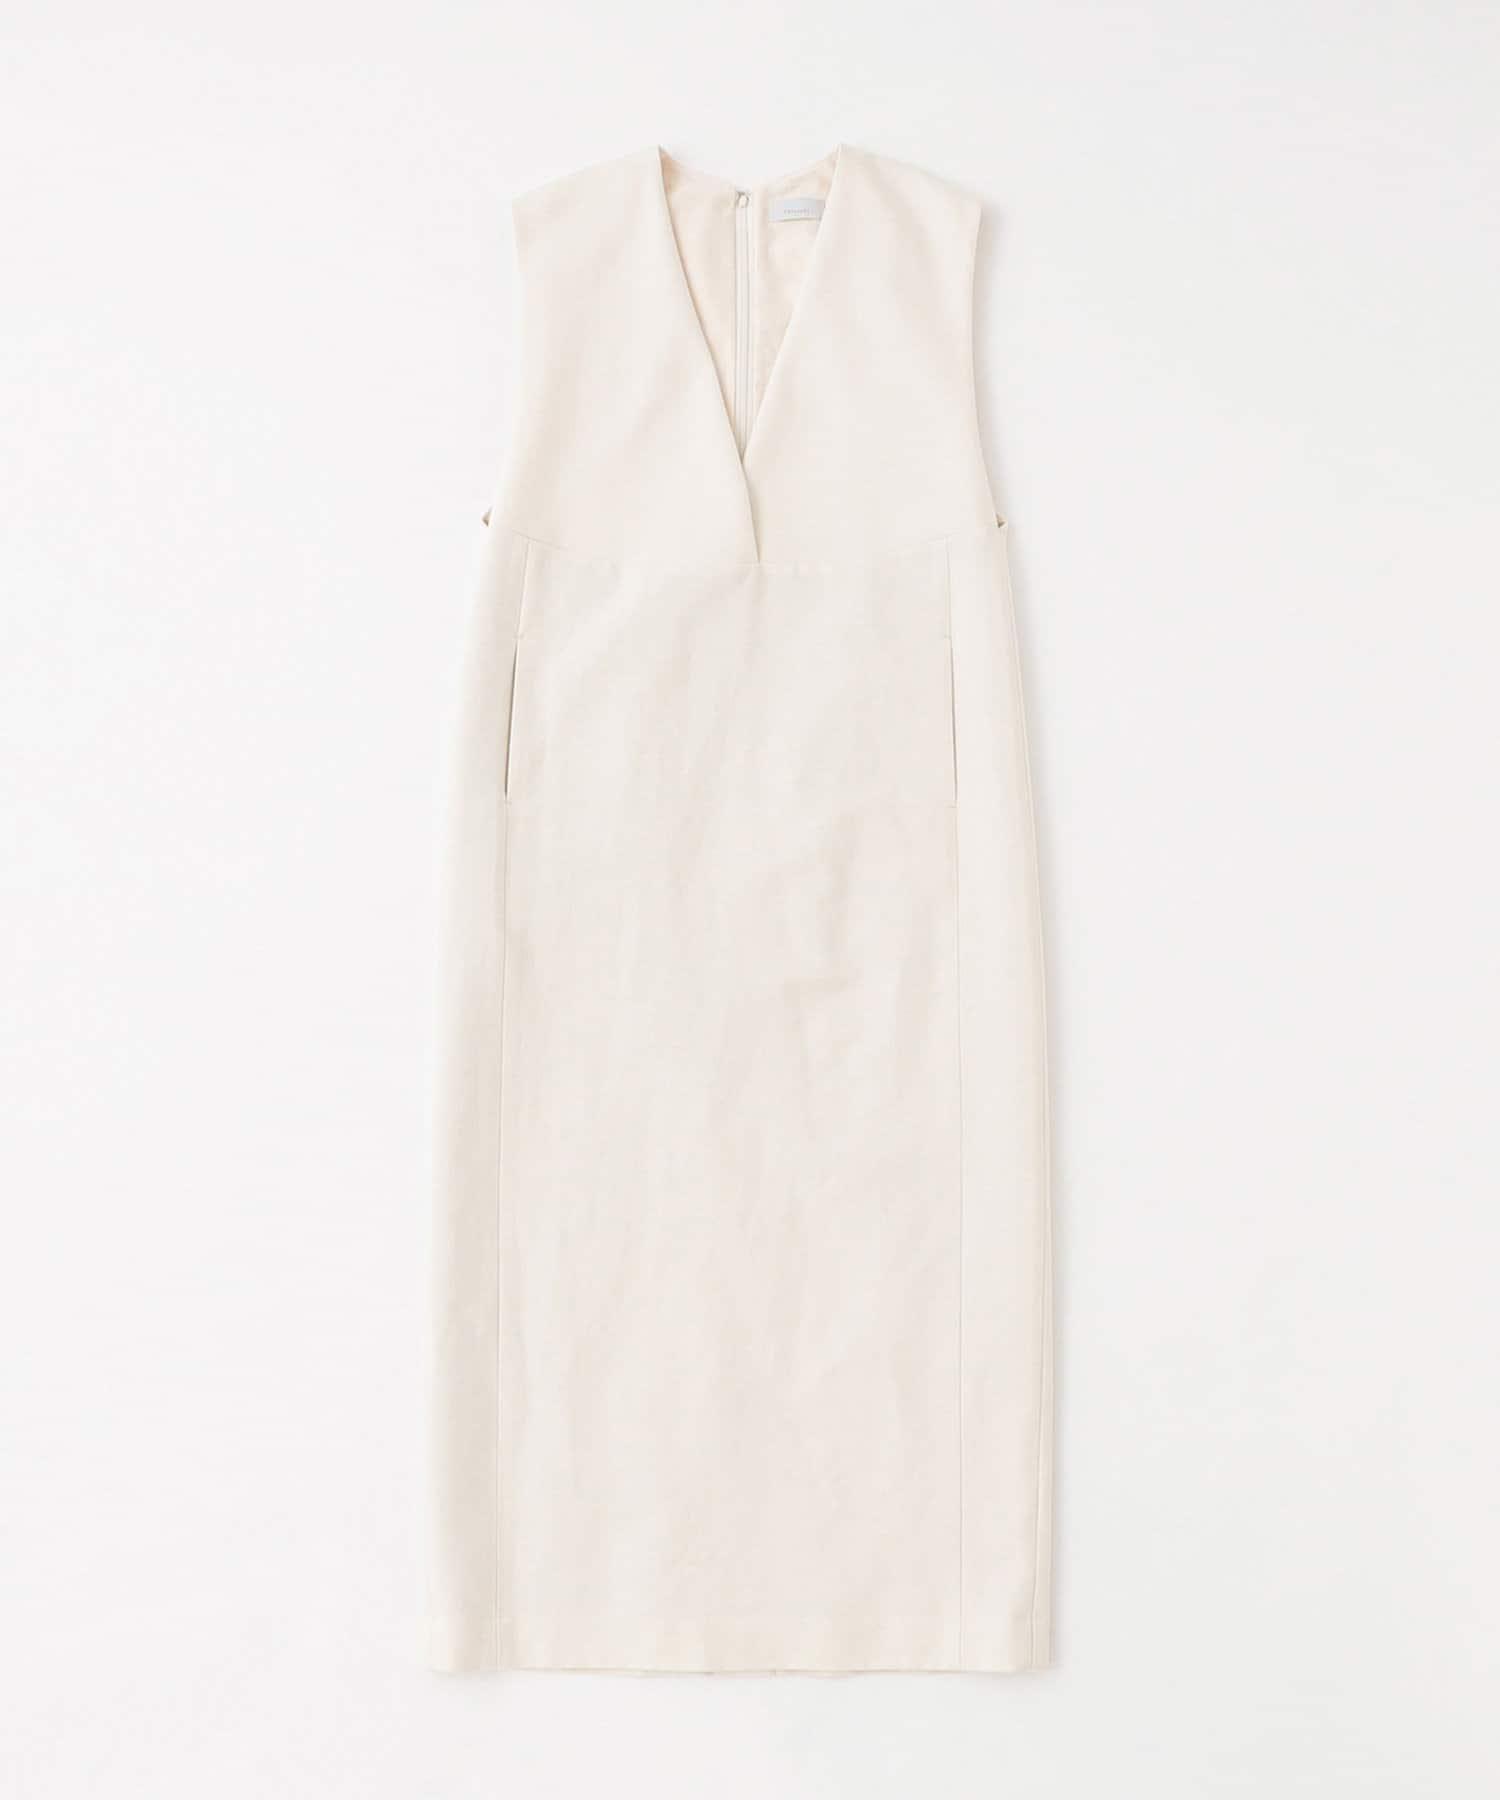 BLOOM&BRANCH(ブルームアンドブランチ) Phlannèl / Waistcoat Dress